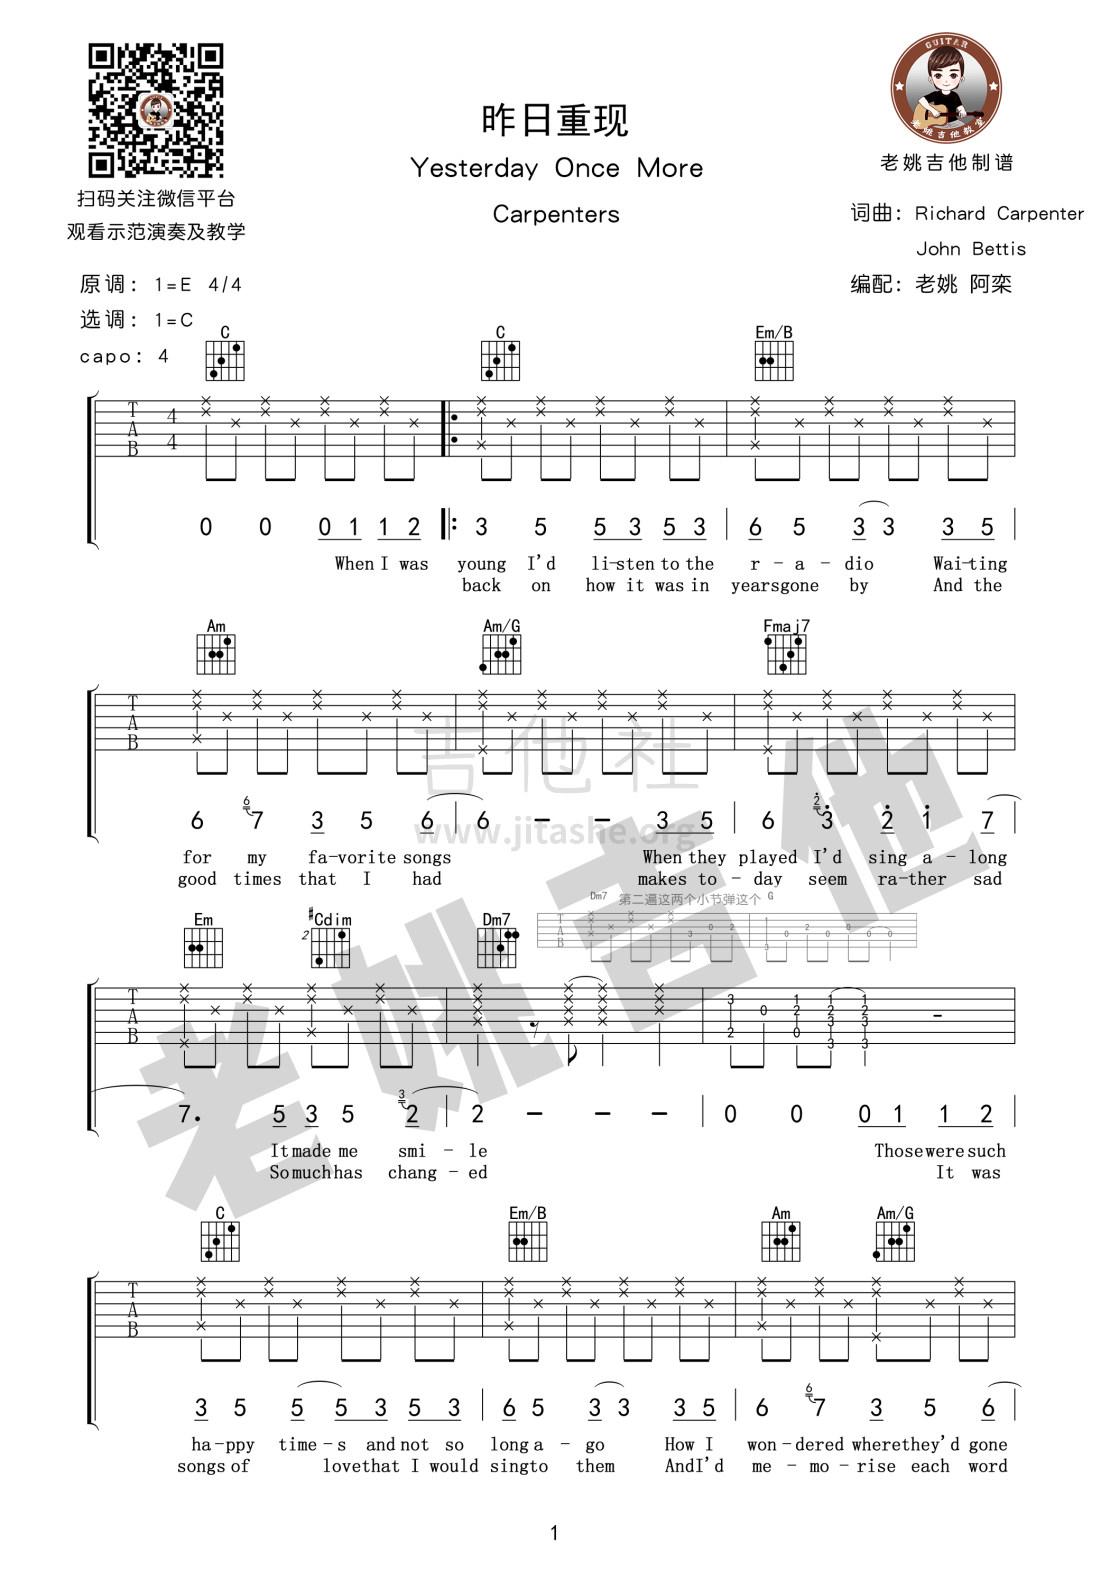 Yesterday Once More(昨日重现)吉他谱(图片谱,弹唱,伴奏,老姚吉他)_Carpenters(卡朋特;木匠兄妹)_昨日重现01.jpg